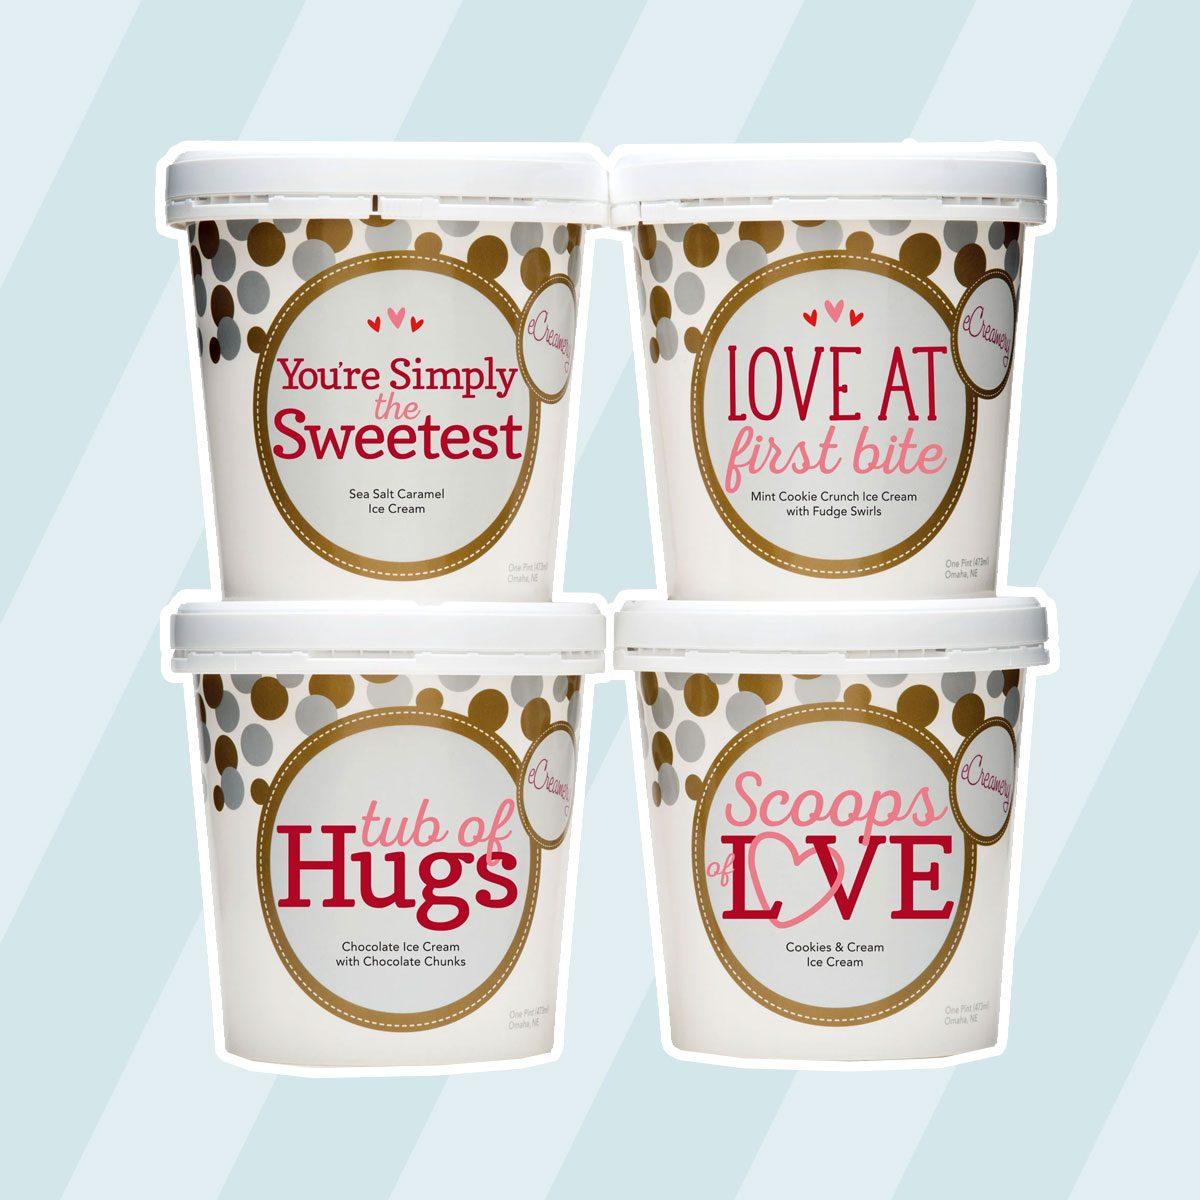 Tubs Of Hugs Ice Cream